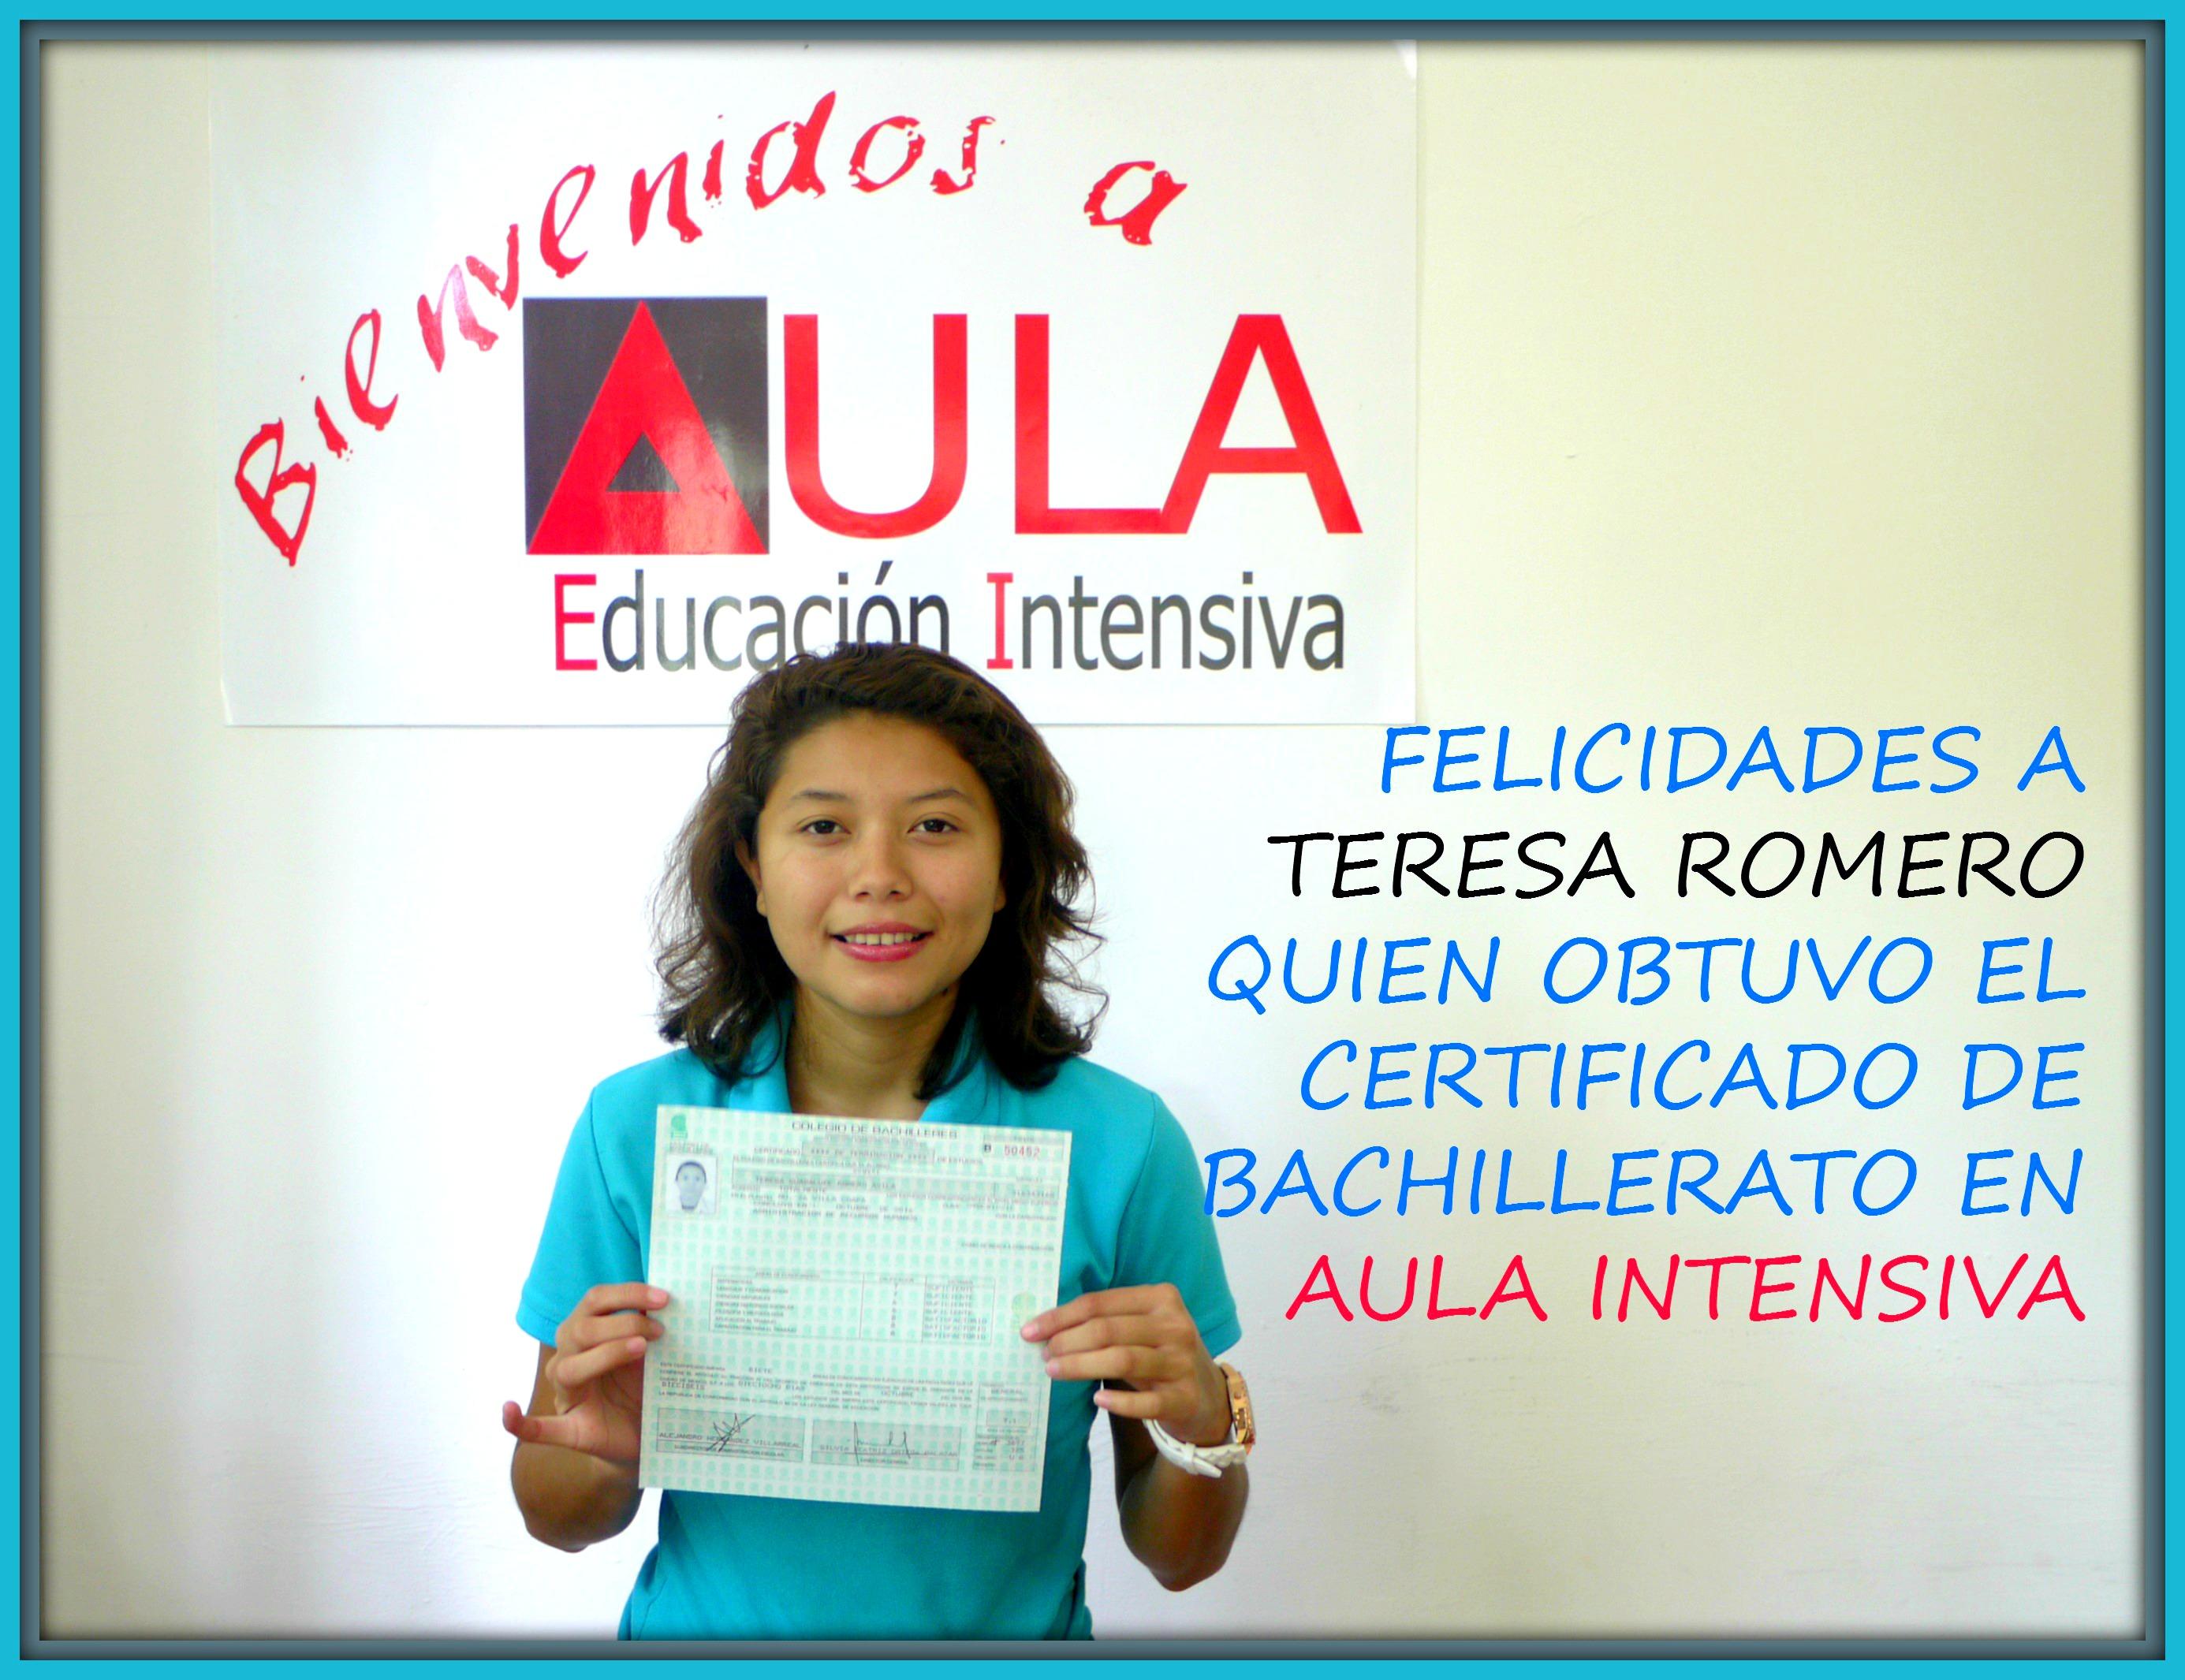 TeresaRomero-Certificado